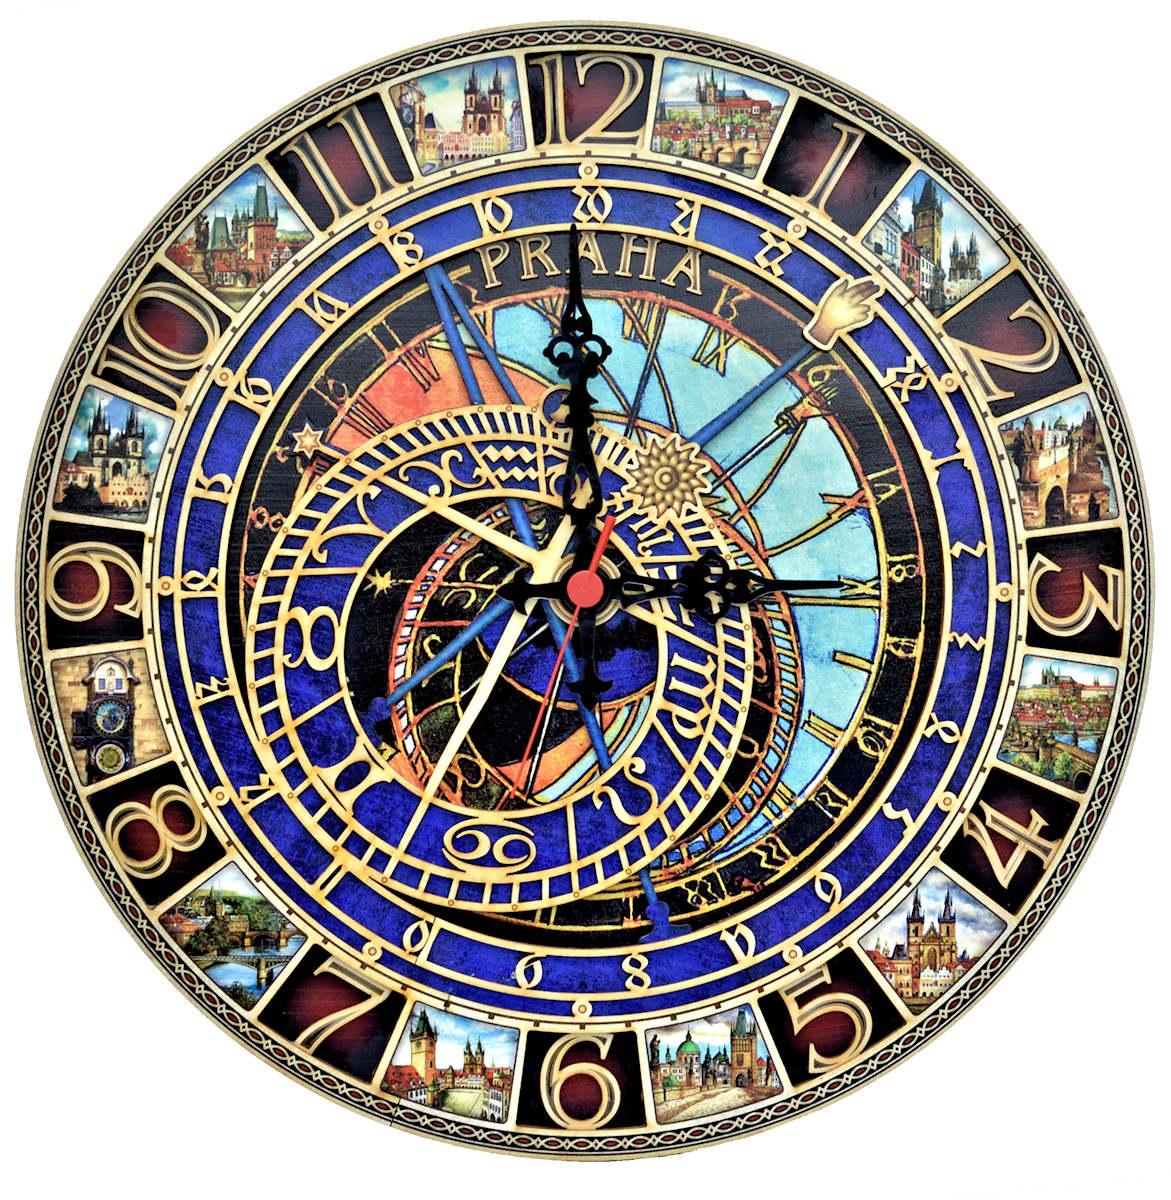 Prague Astronomical Clock In Prague Stock Photo - Download